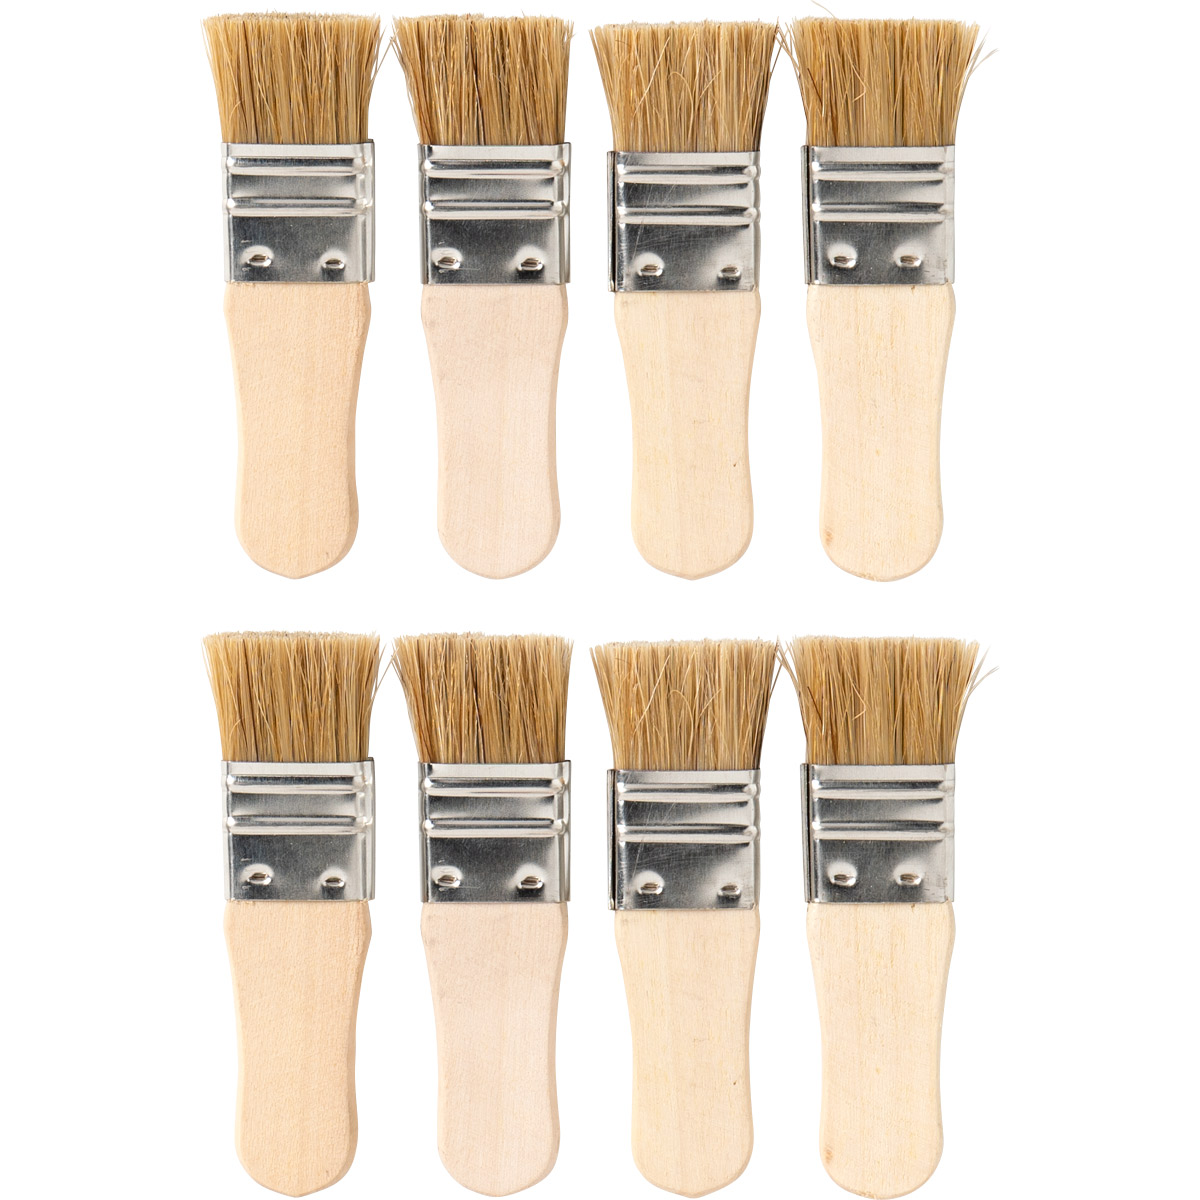 Apple Barrel ® Brush Sets - Short Handle Chip Set, 8 pc. - 44352E